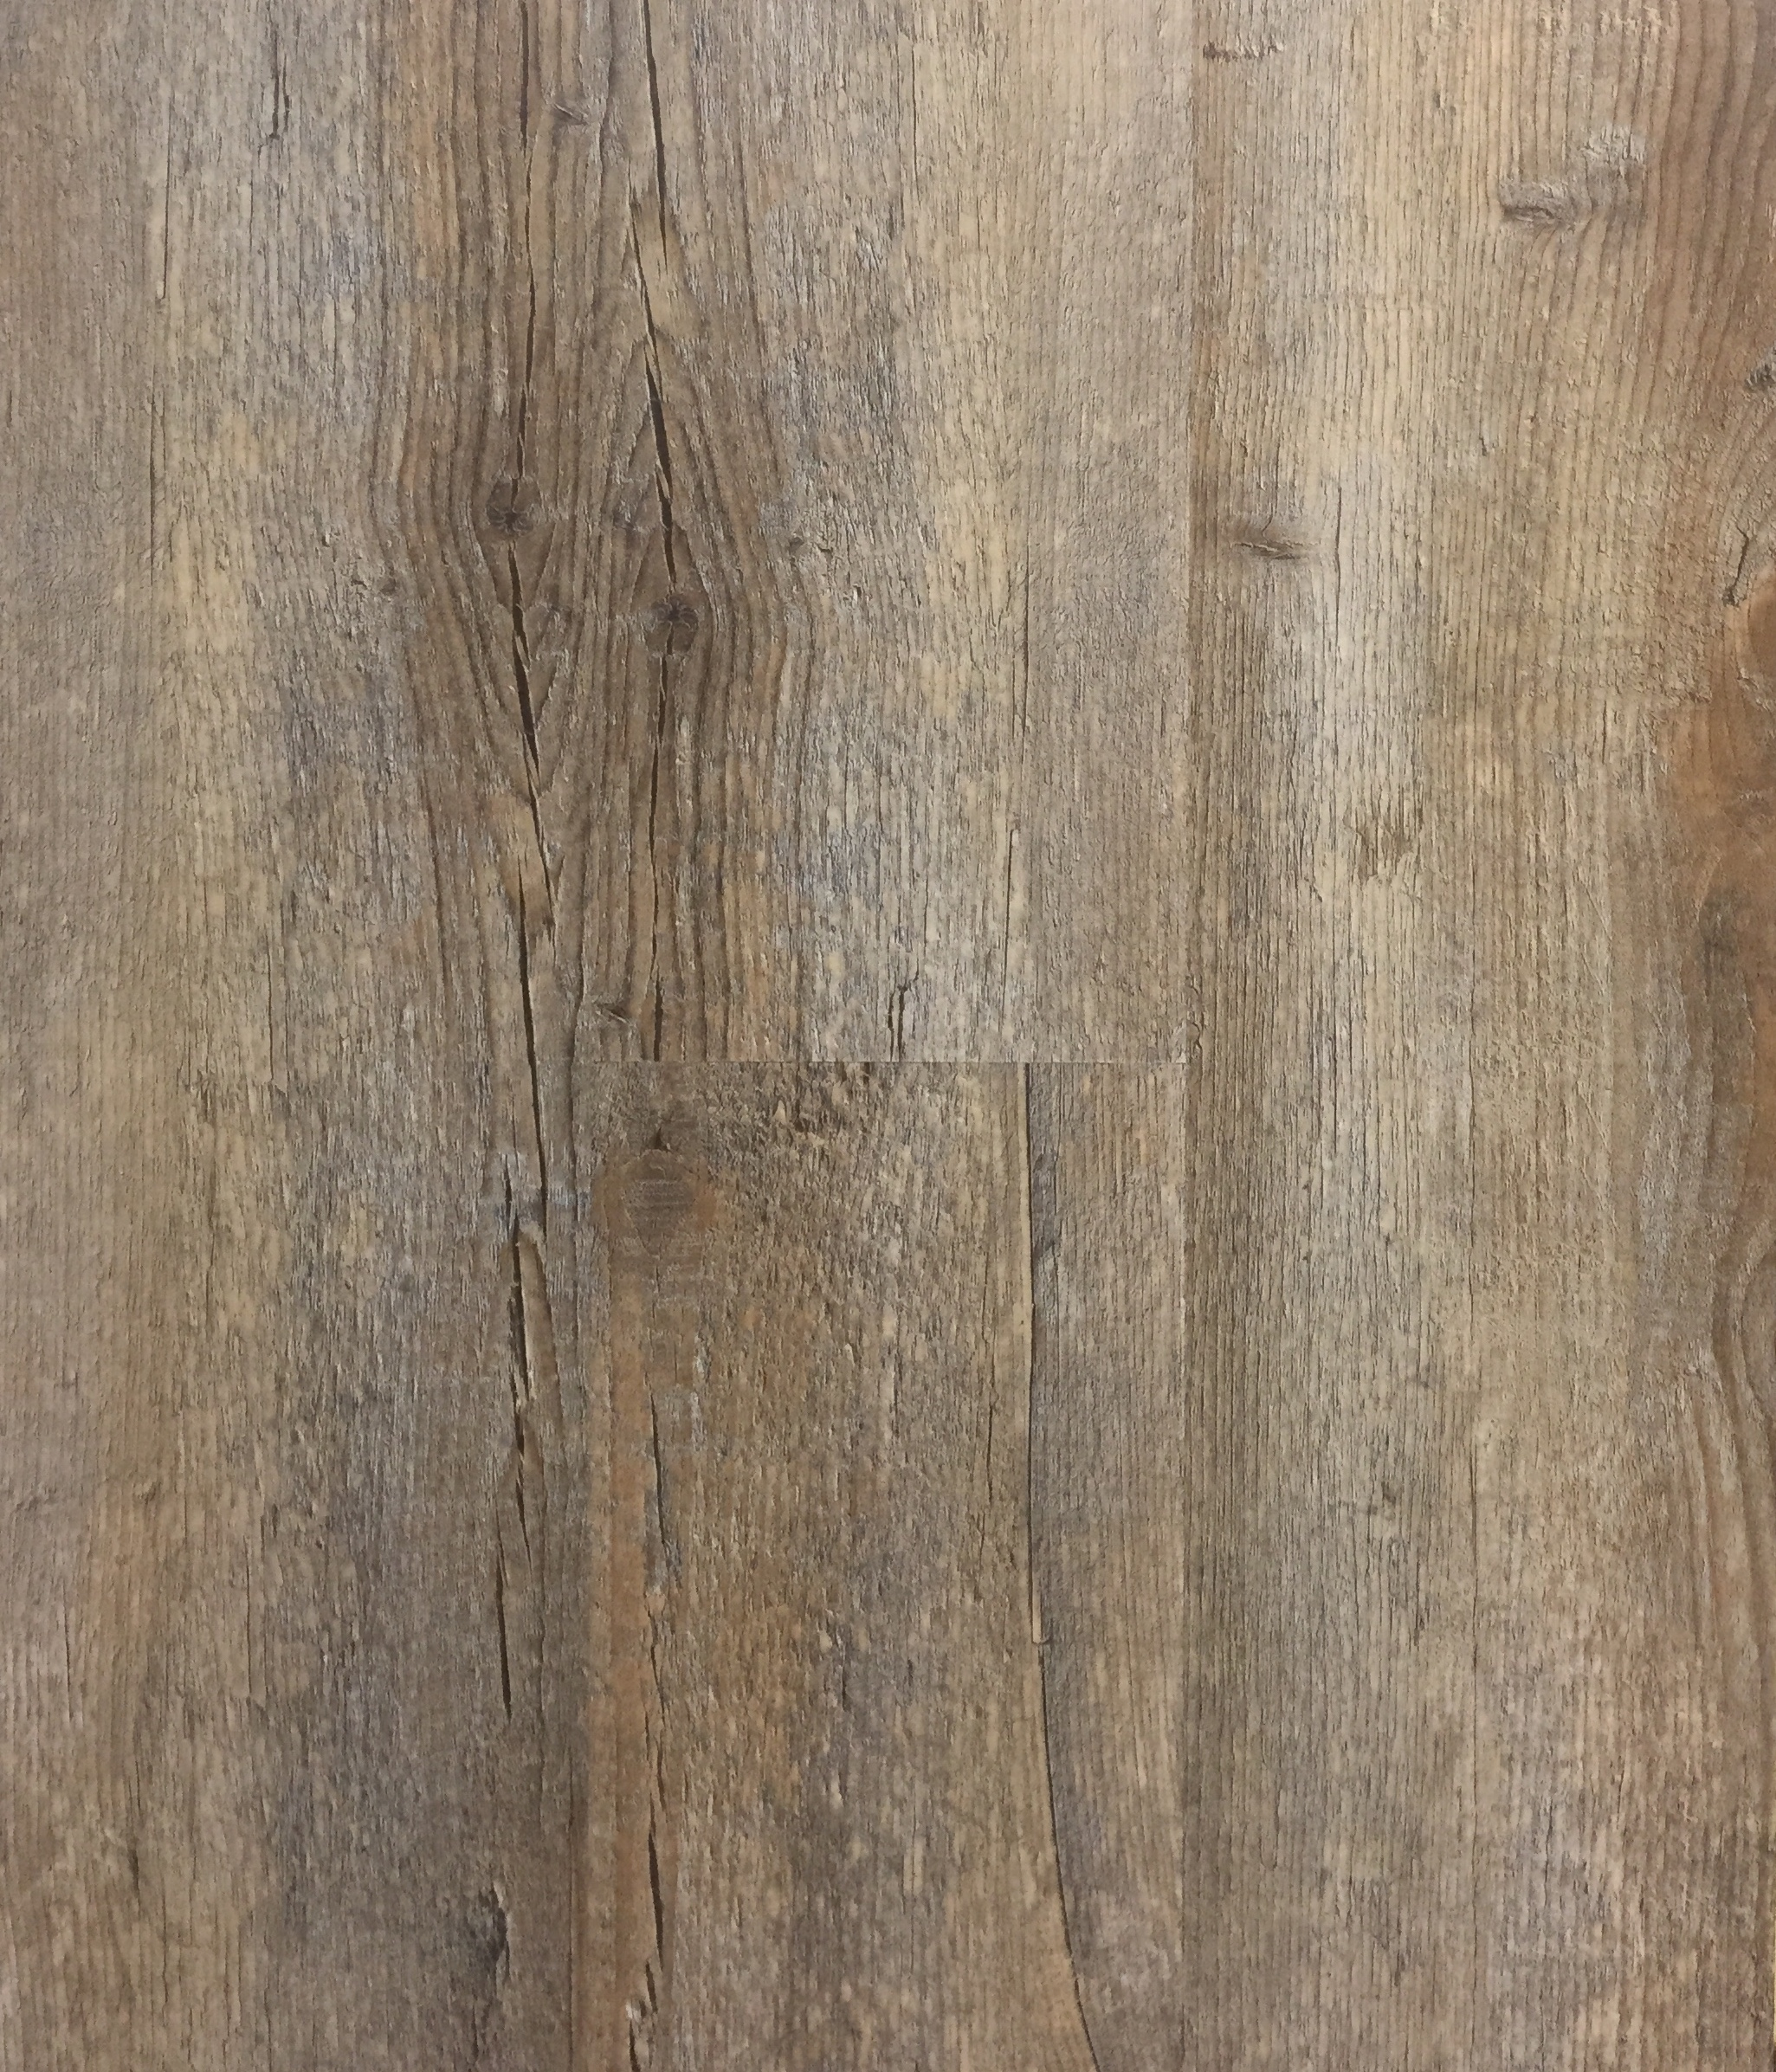 504 Driftwood